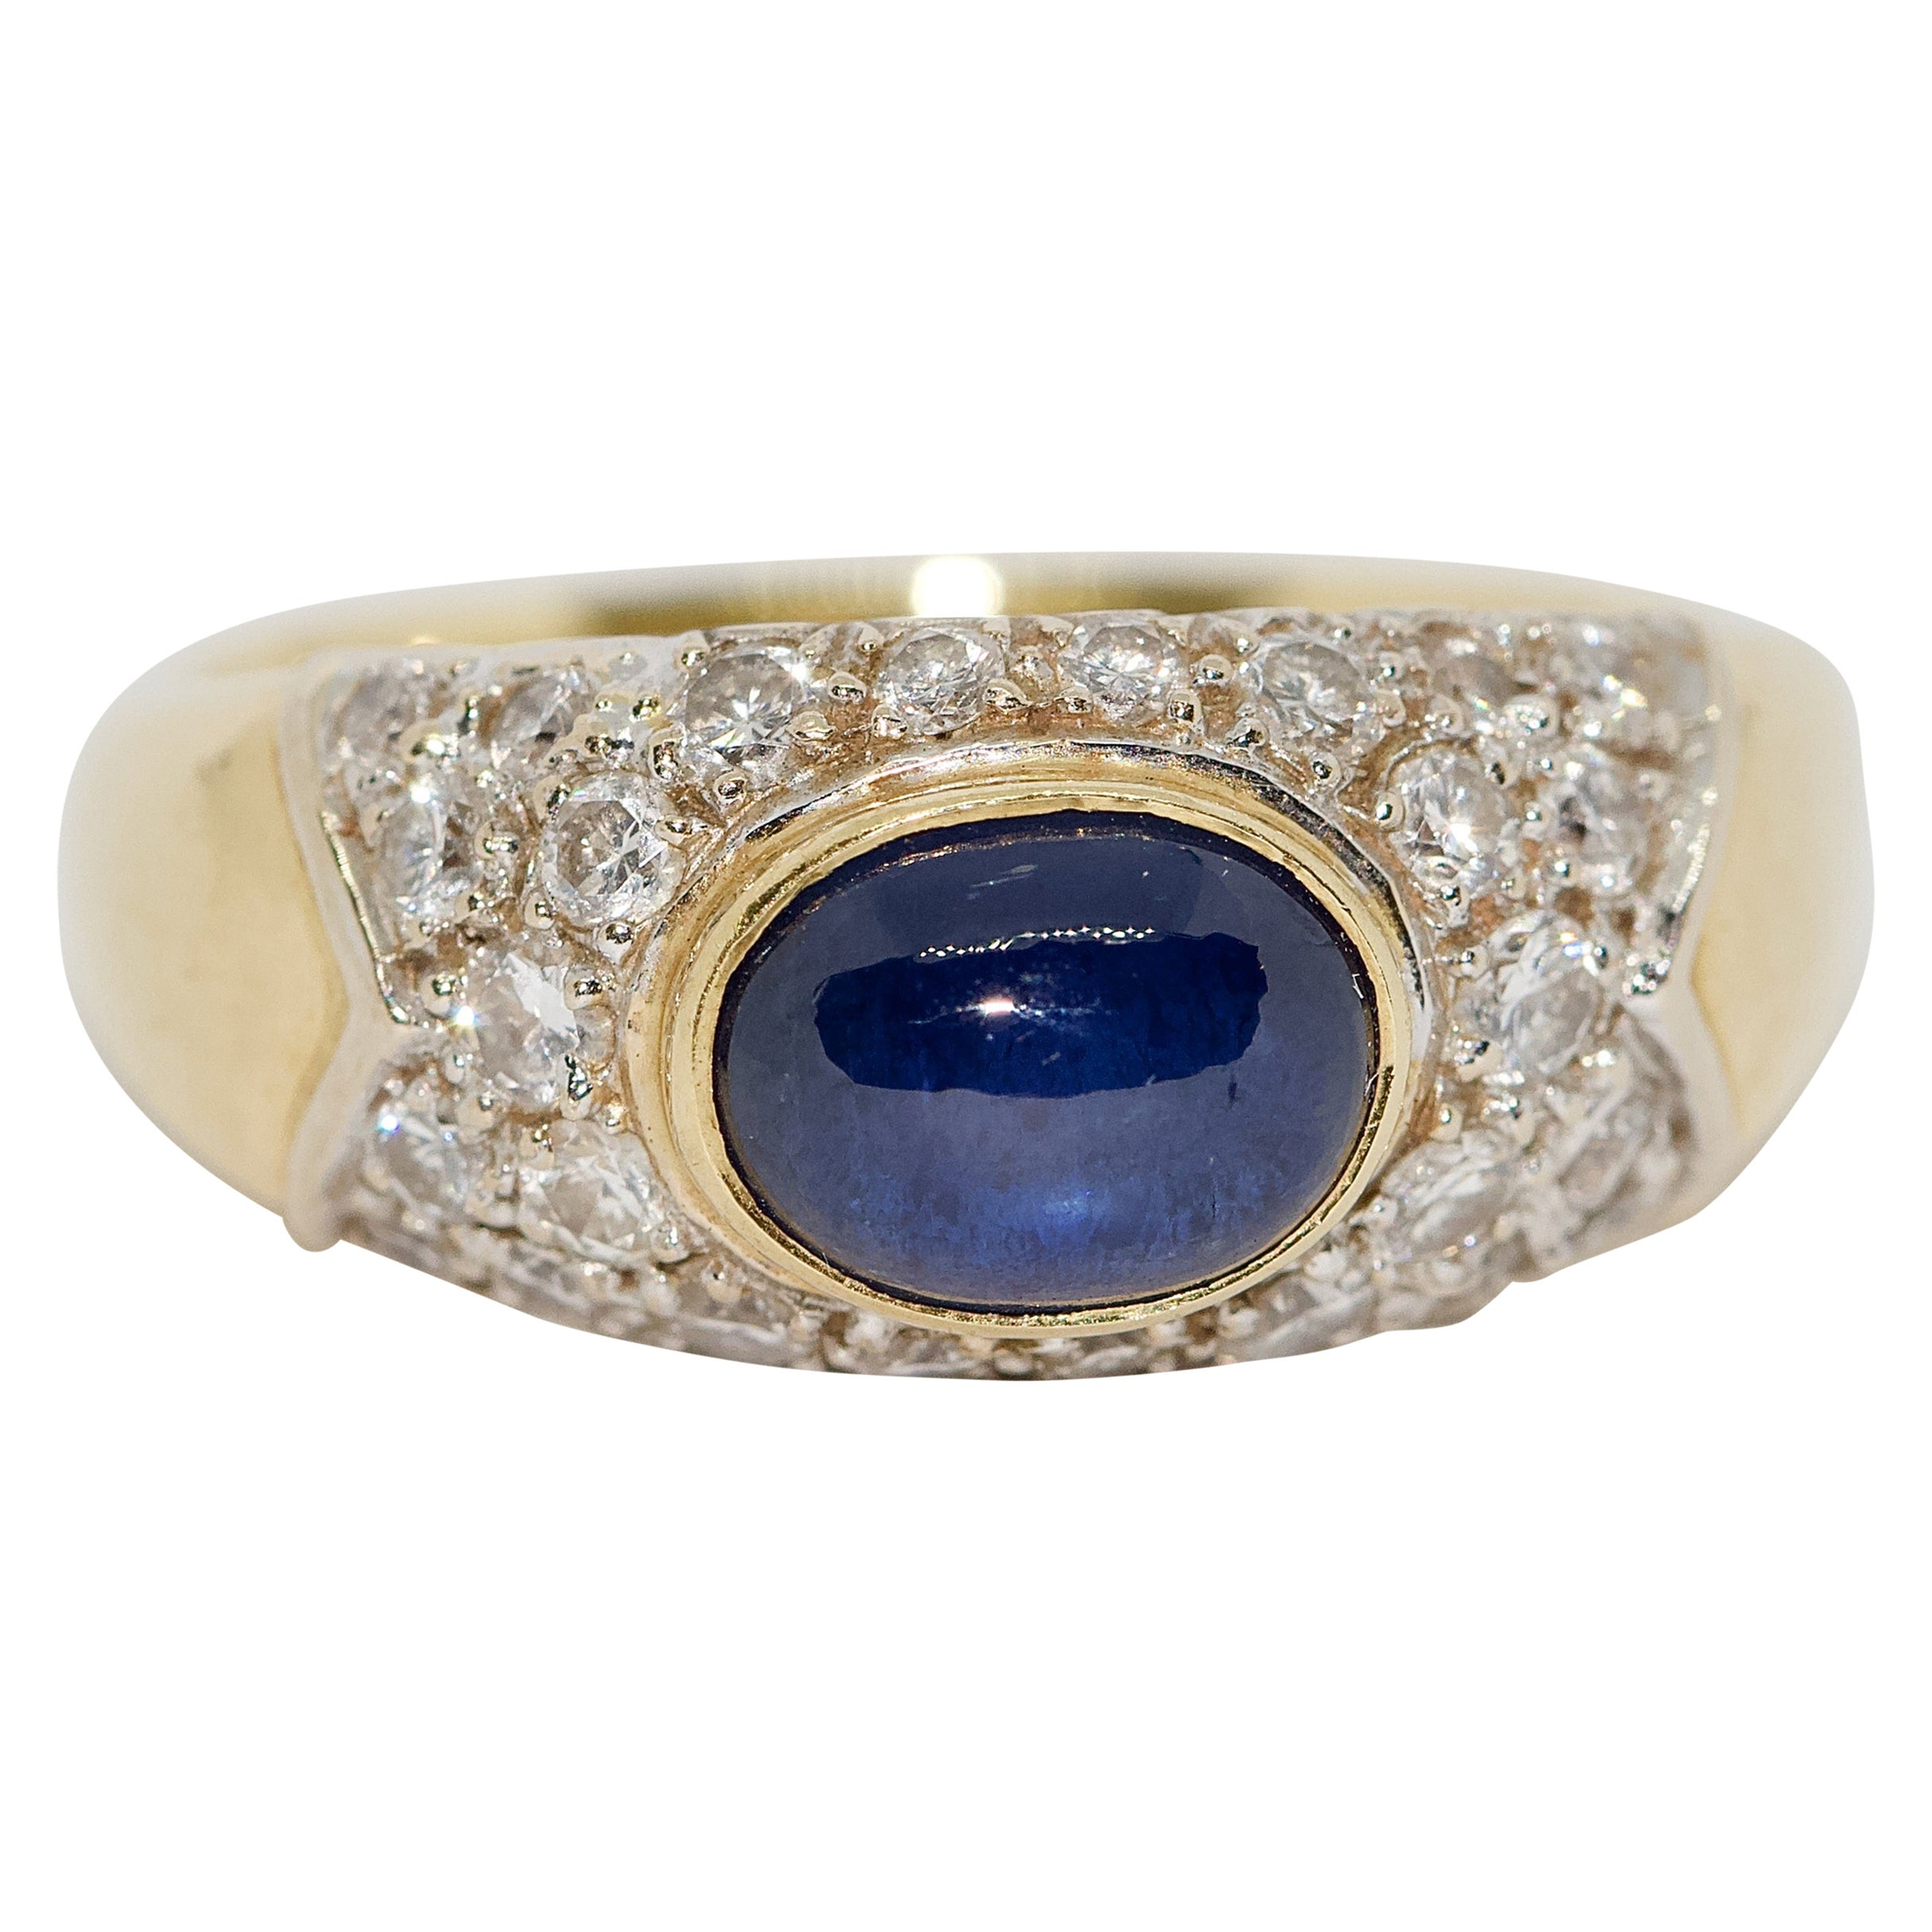 Ladies Ring, 18 Karat Gold with 1.64 Carat Blue Sapphire and Diamonds